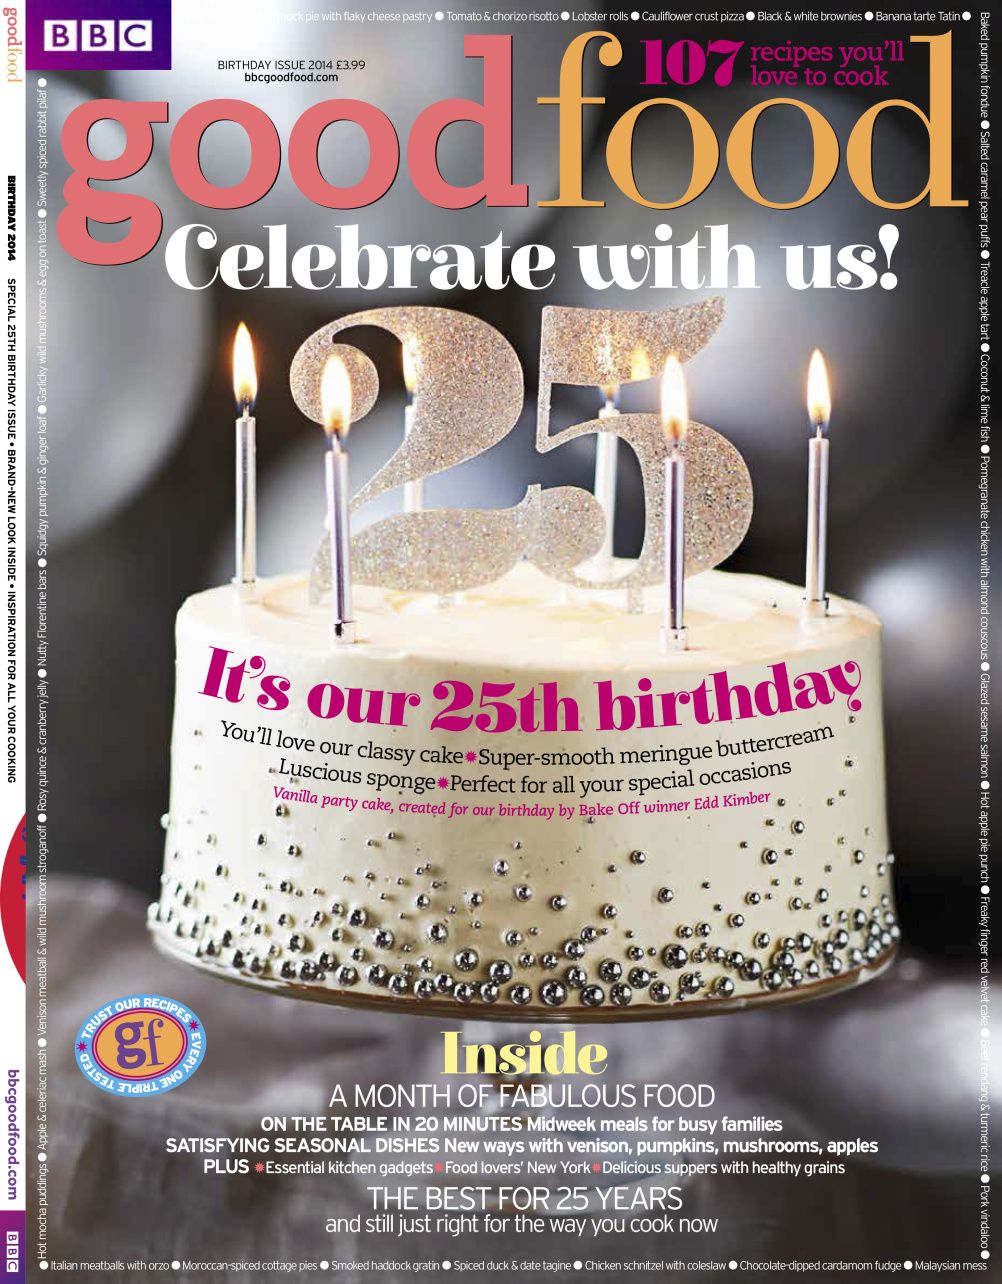 BBC Good Food 25th Birthday Magazine Cover